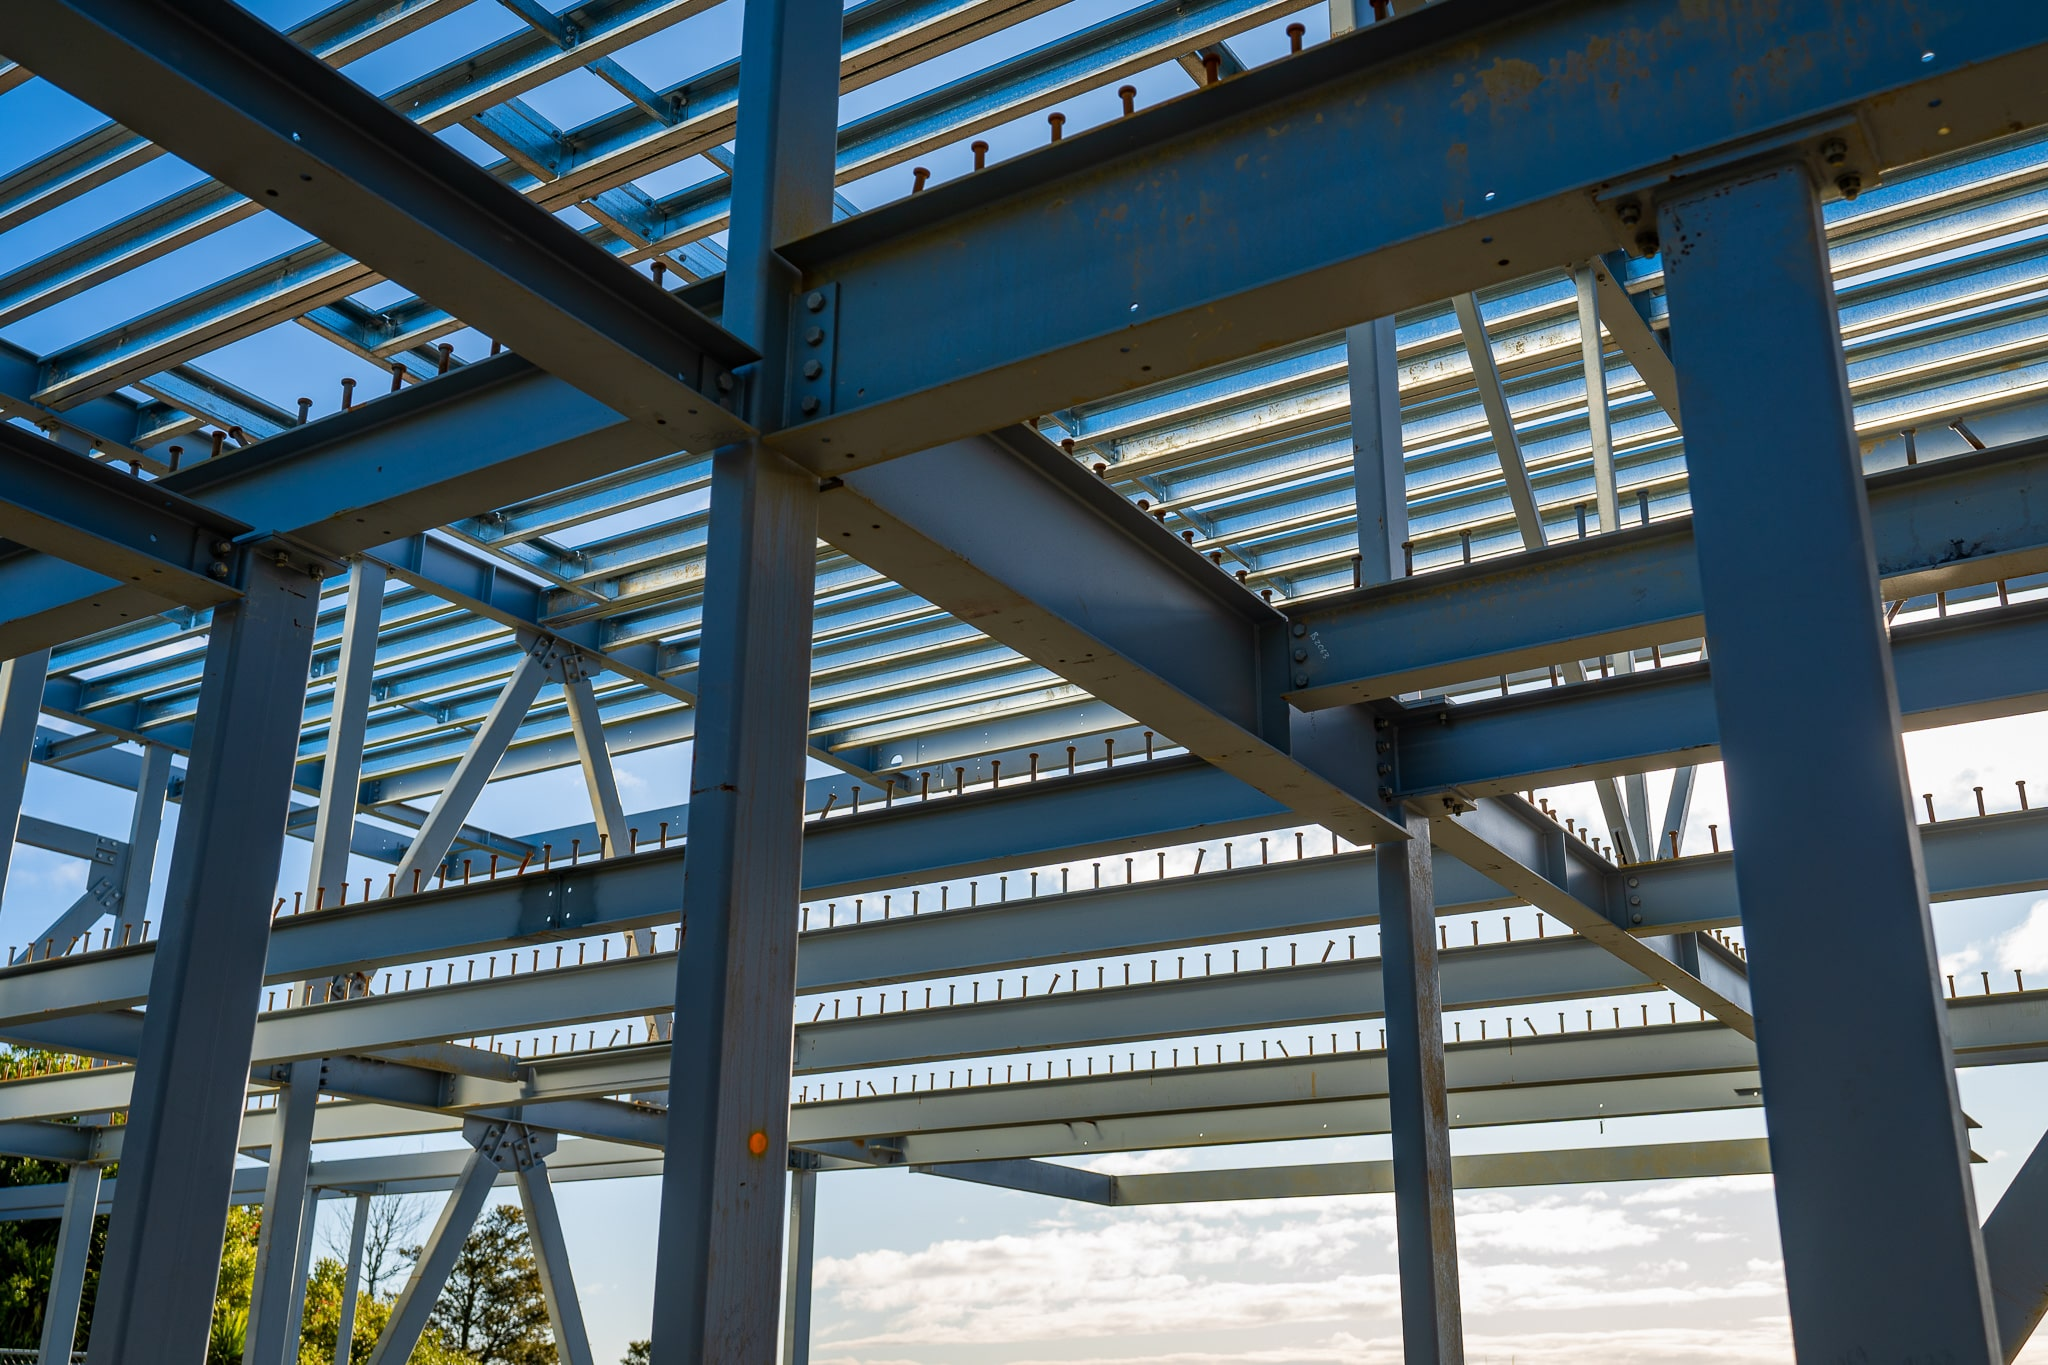 vip_steel_glenelg_residential_project_momac_pics_6